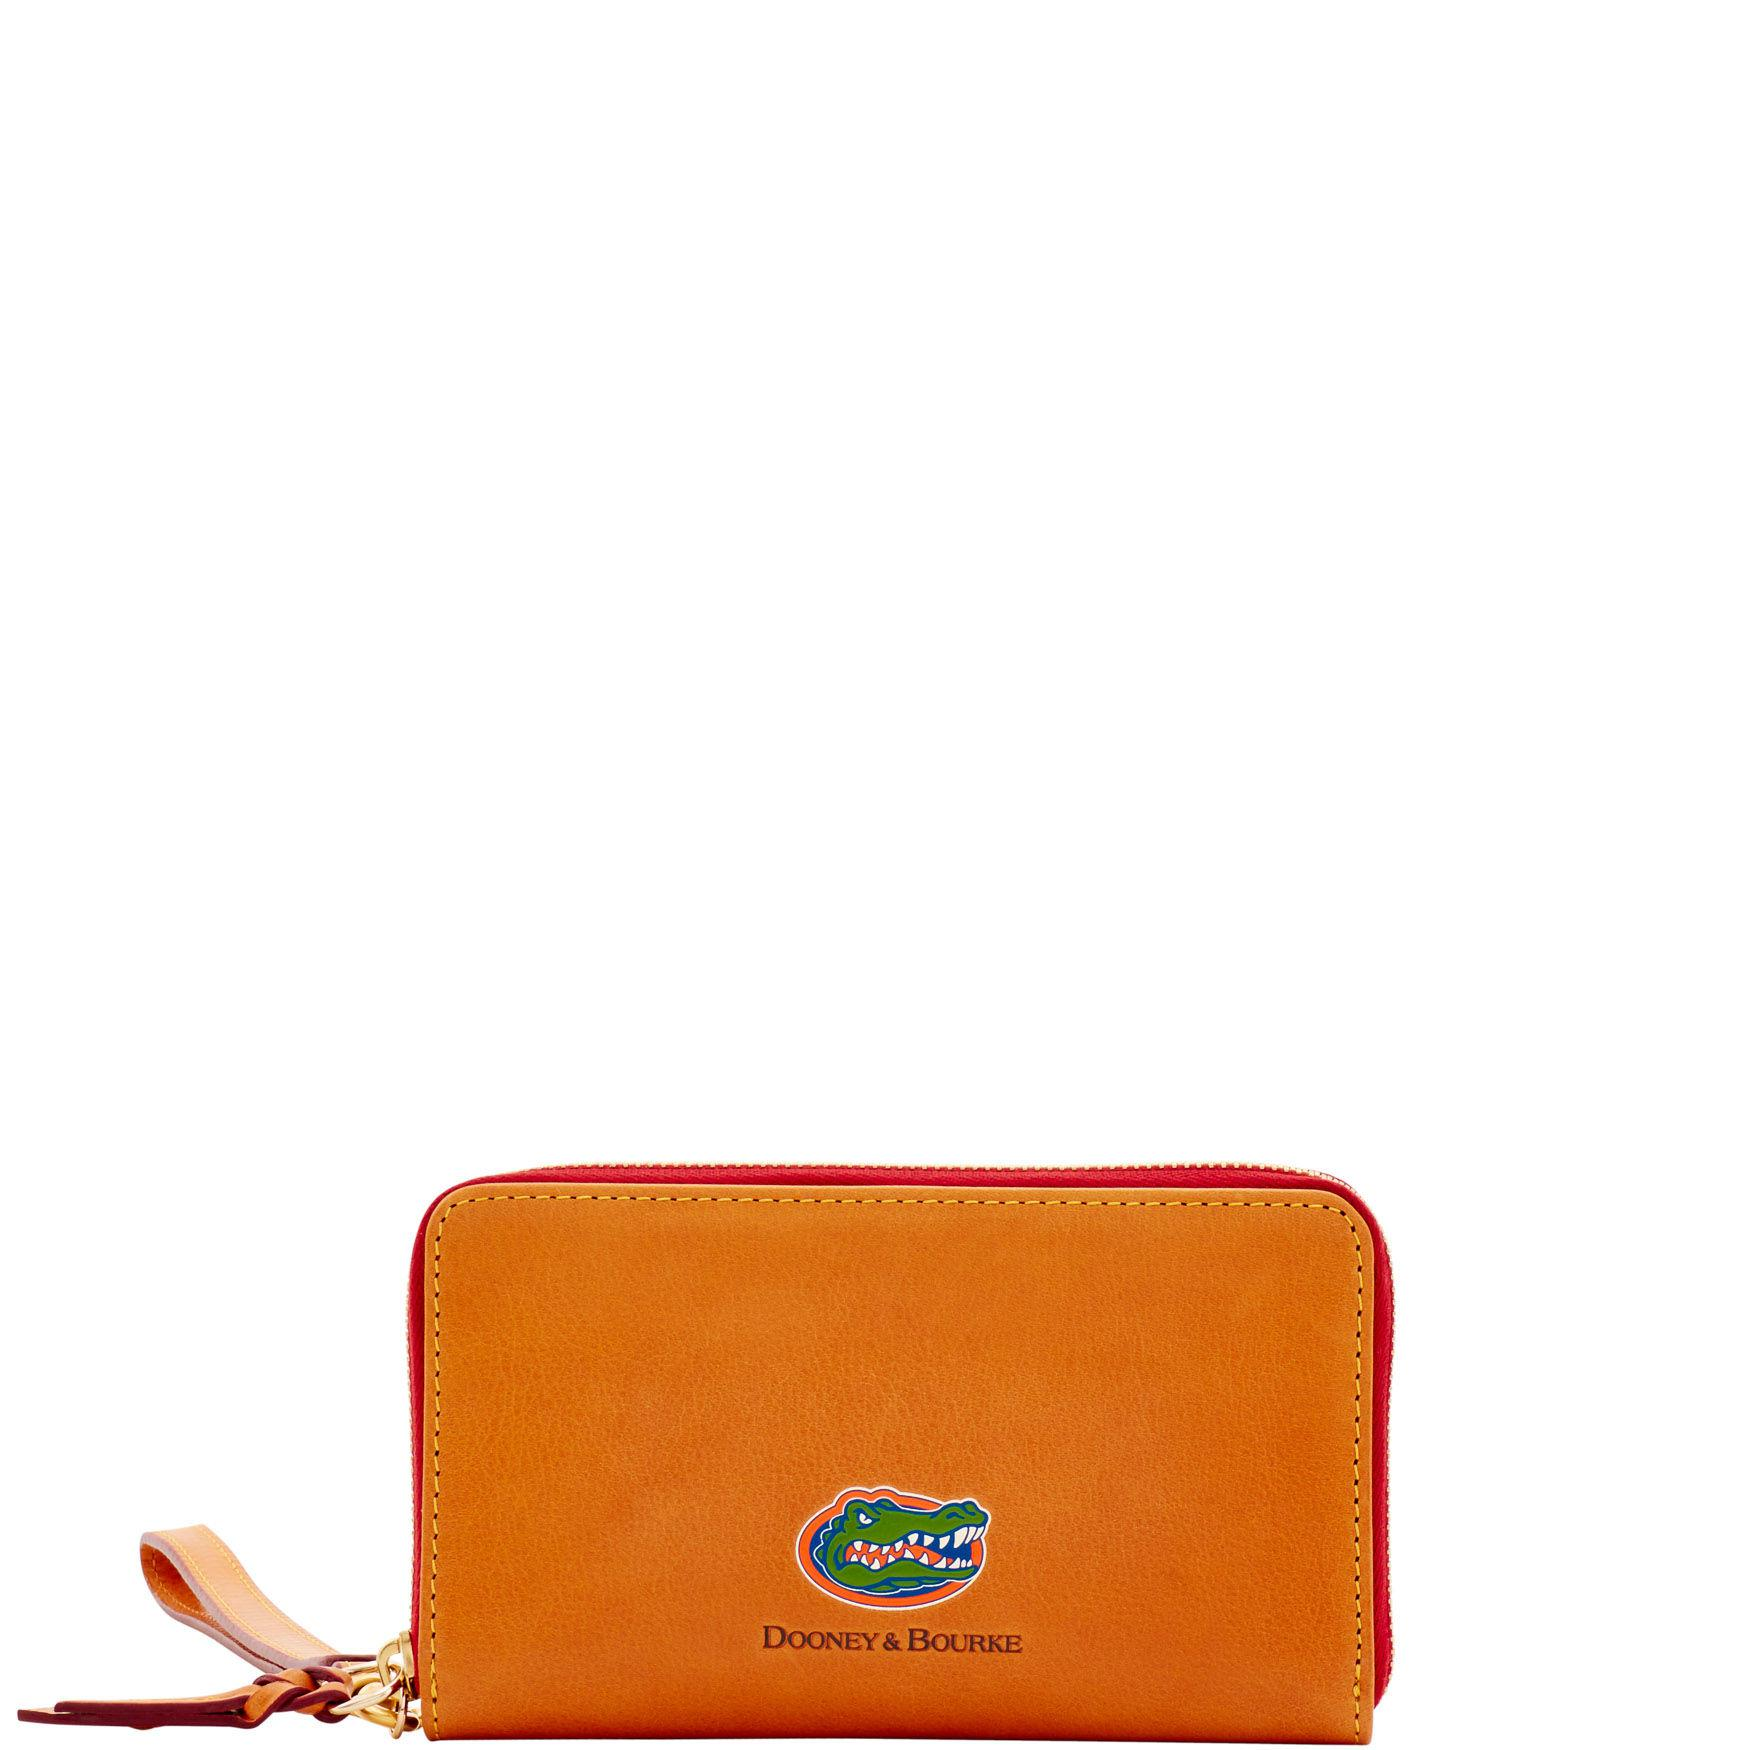 Leather Zip Around Wallet - Mr. Zip Portefeuille En Cuir - Mr. Cardinal By Vida Vida Cardinal Par Vida Vida VG5dS